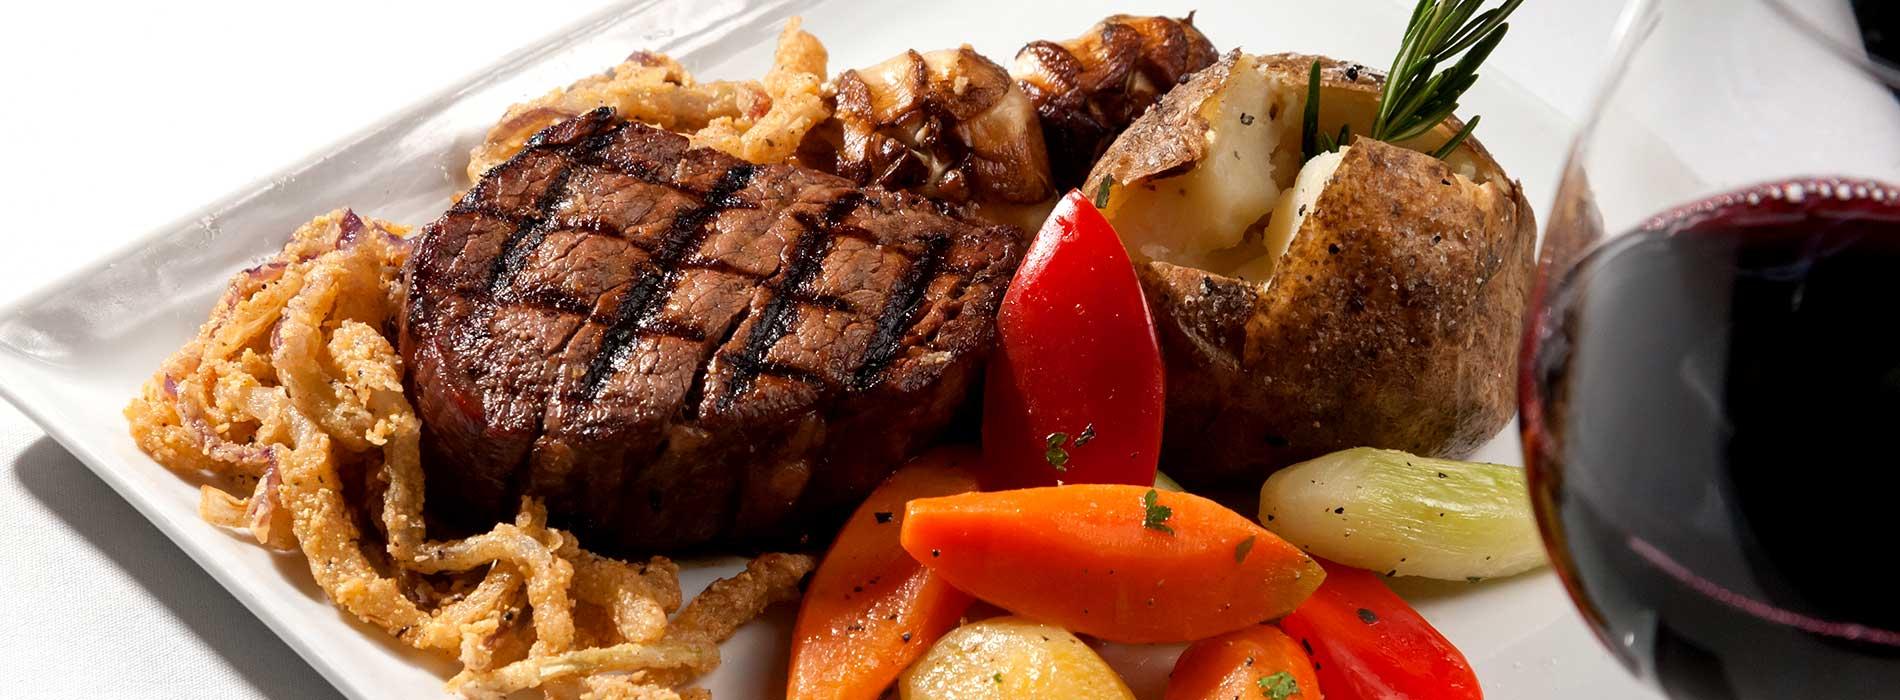 Home Steak En